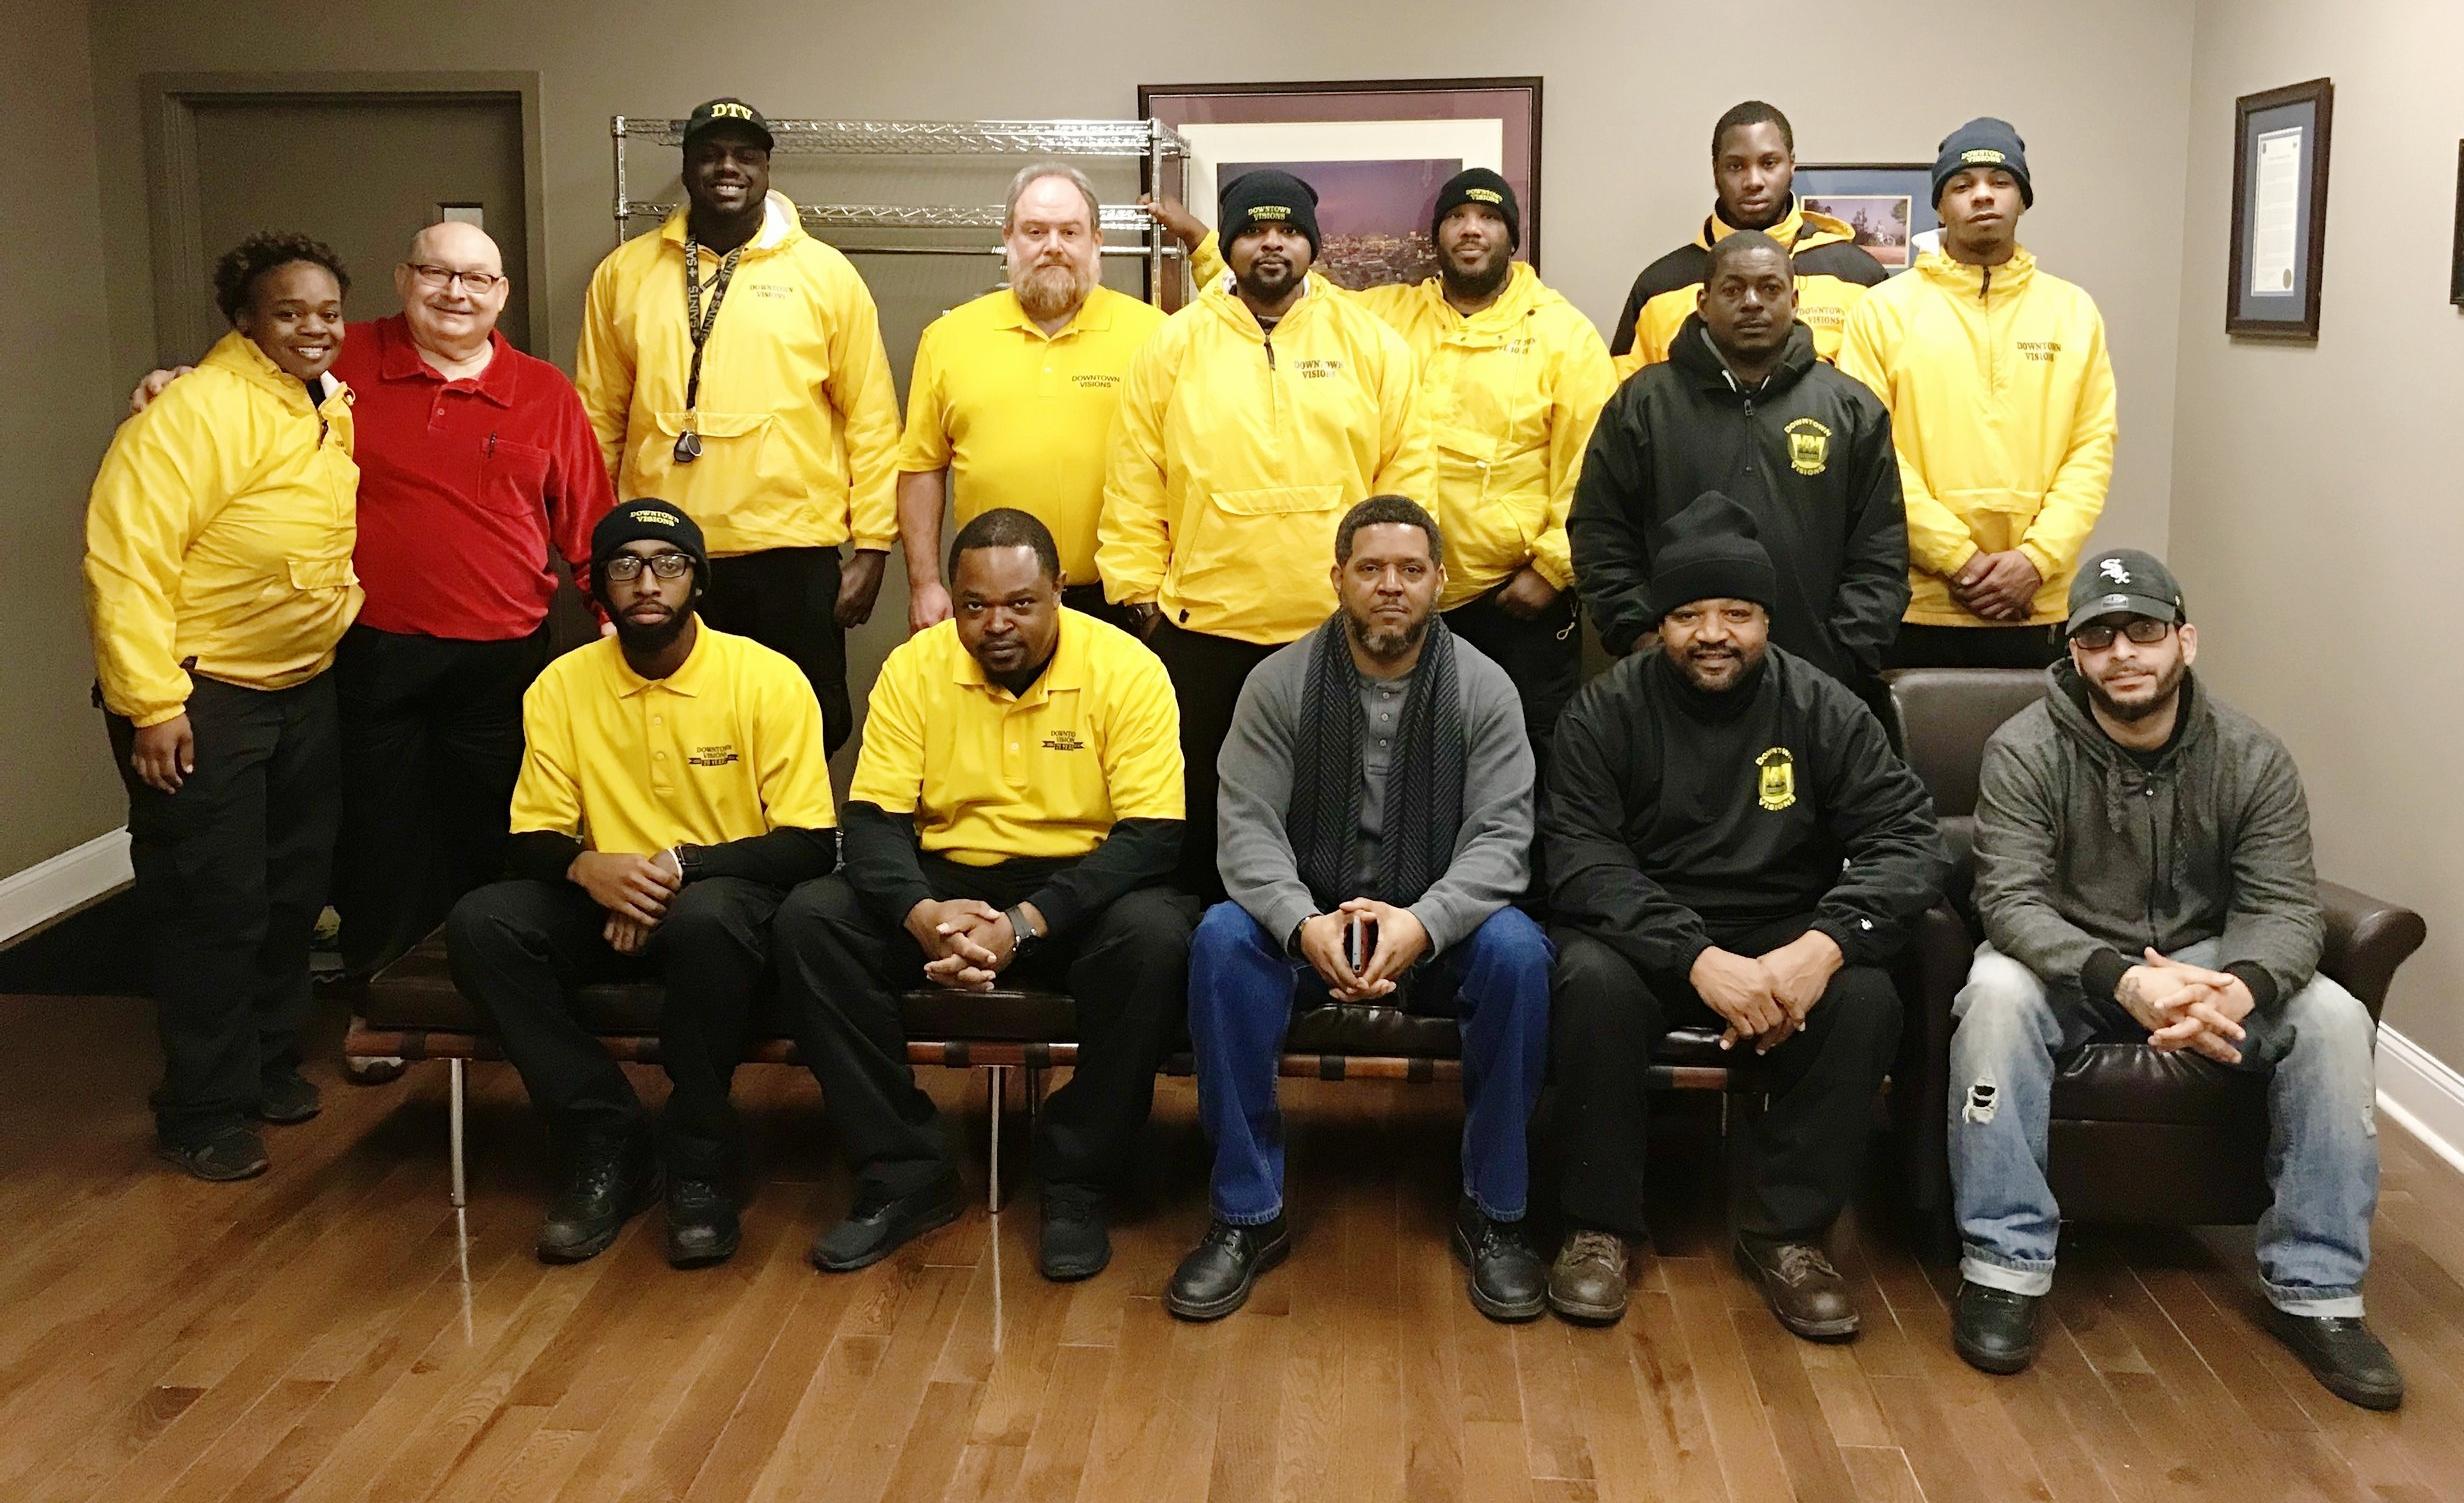 2018 Downtown Visions Ambassador Training Academy Graduates